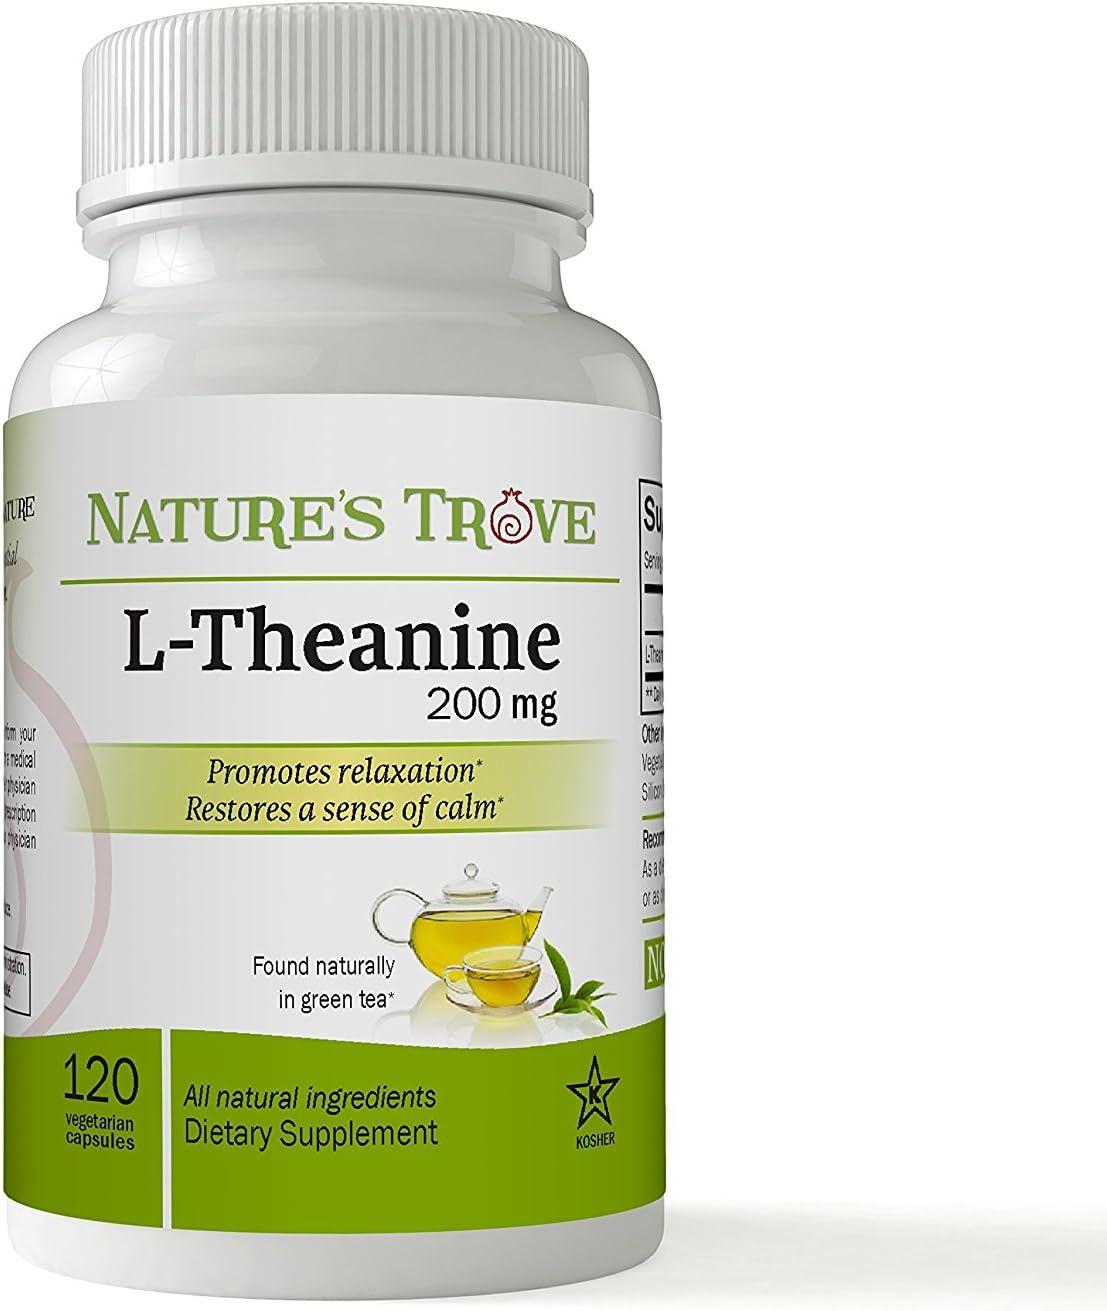 L-Theanine - Relaxing Tea For Better Sleep